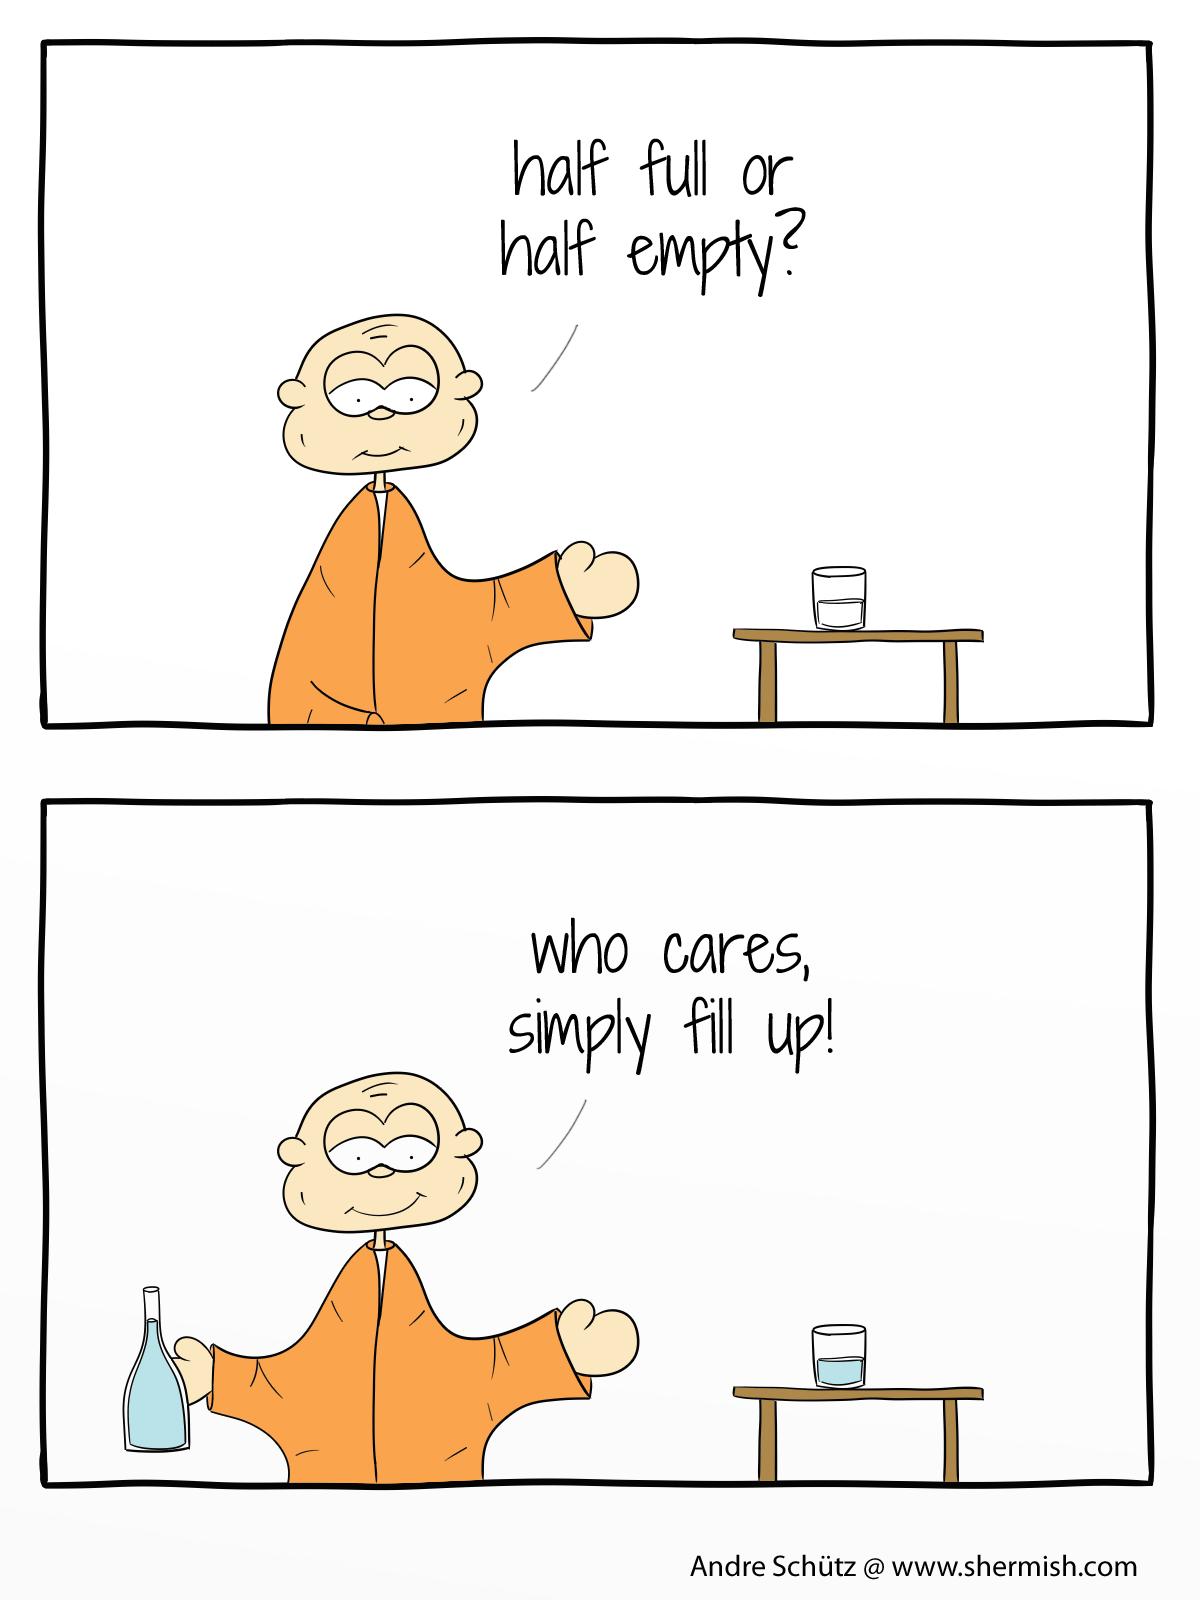 Monktales: Half full or half empty - who cares